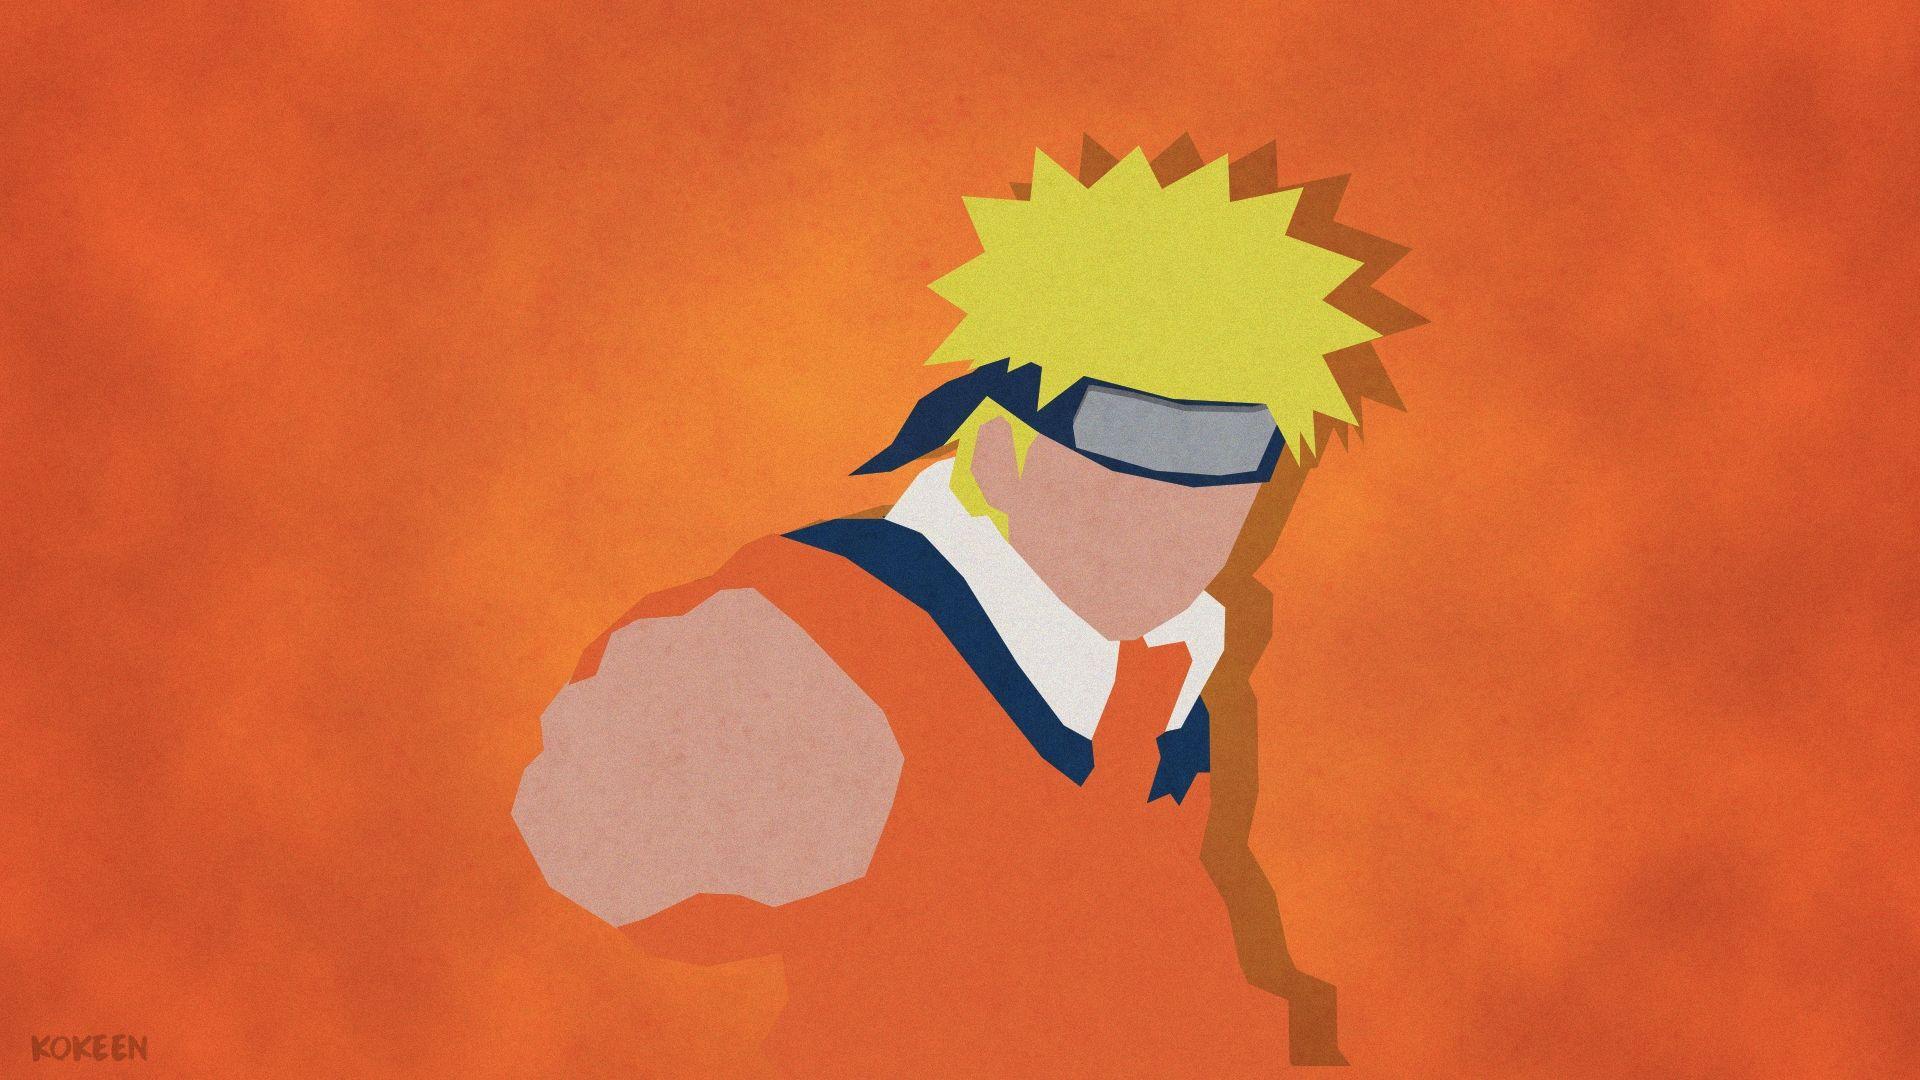 Naruto Minimalist, Cool Wallpaper